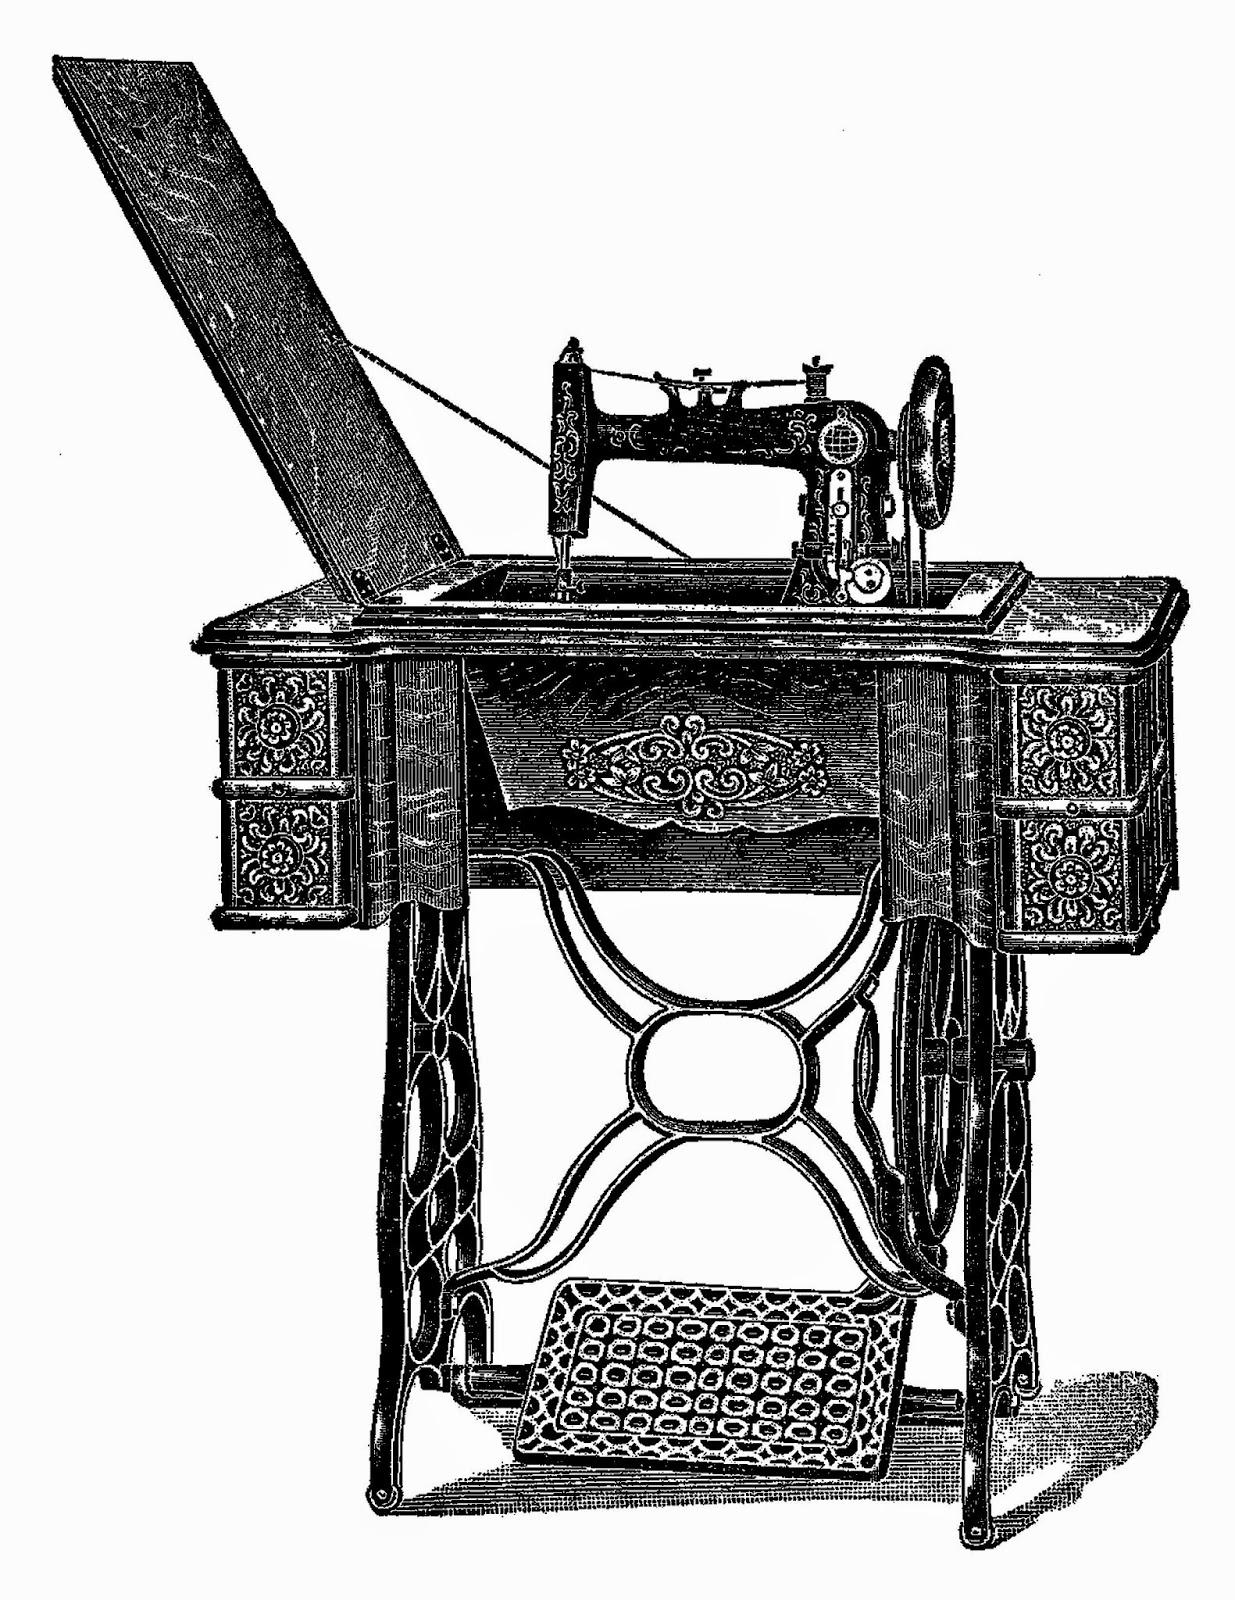 1235x1600 Antique Images Vintage Sewing Machine Digital Download Image